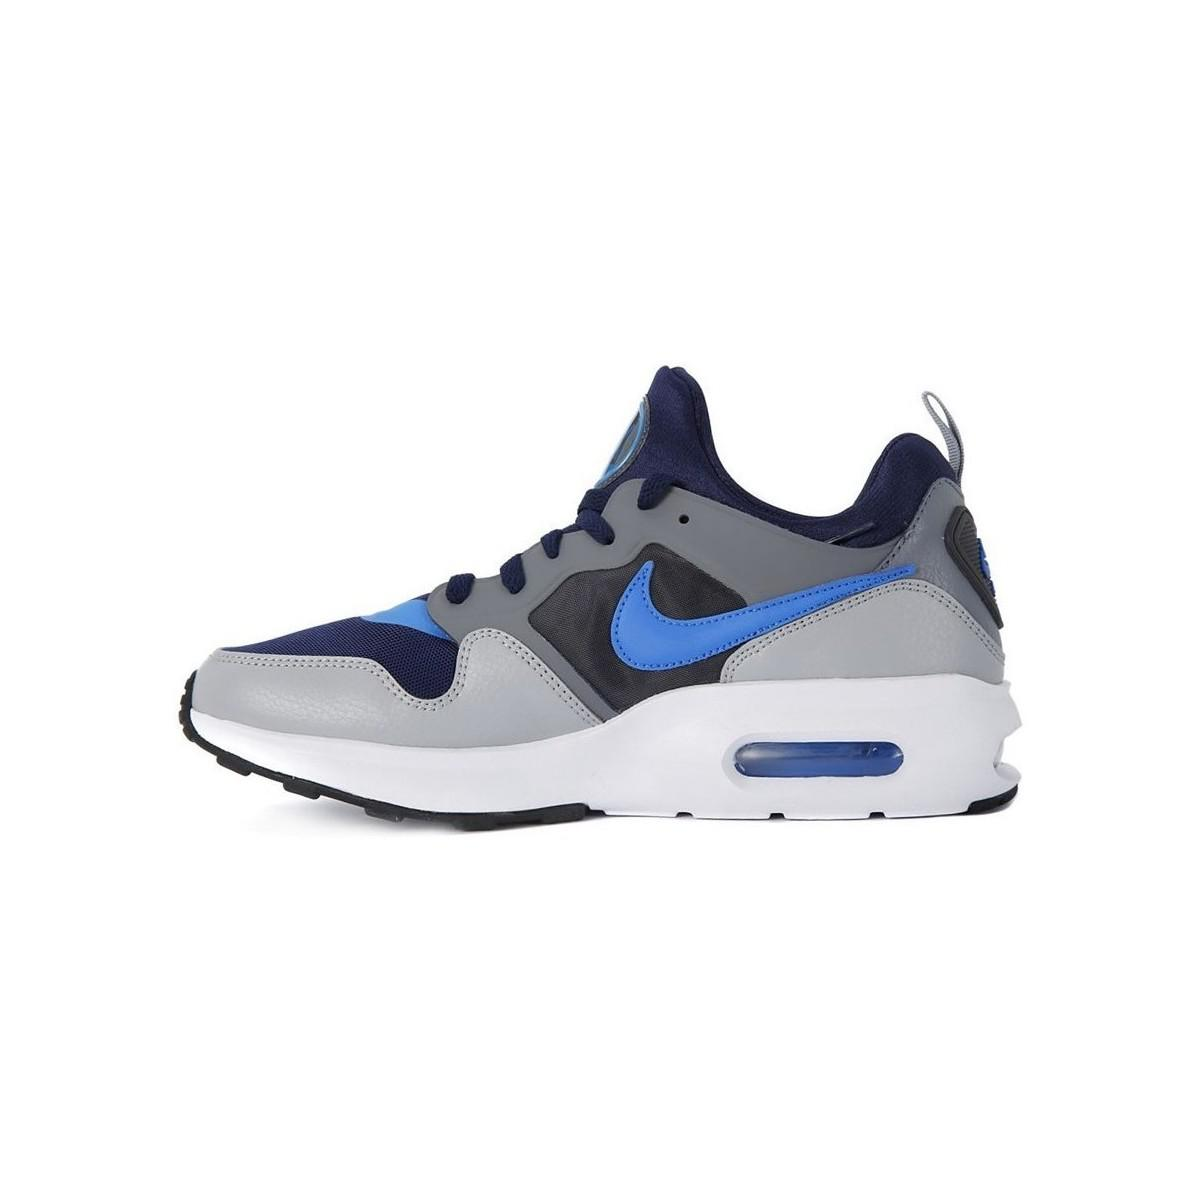 Nike Air Max Prime Midnight Navy/photo Blue Running Shoe 9.5 Men Us for Men